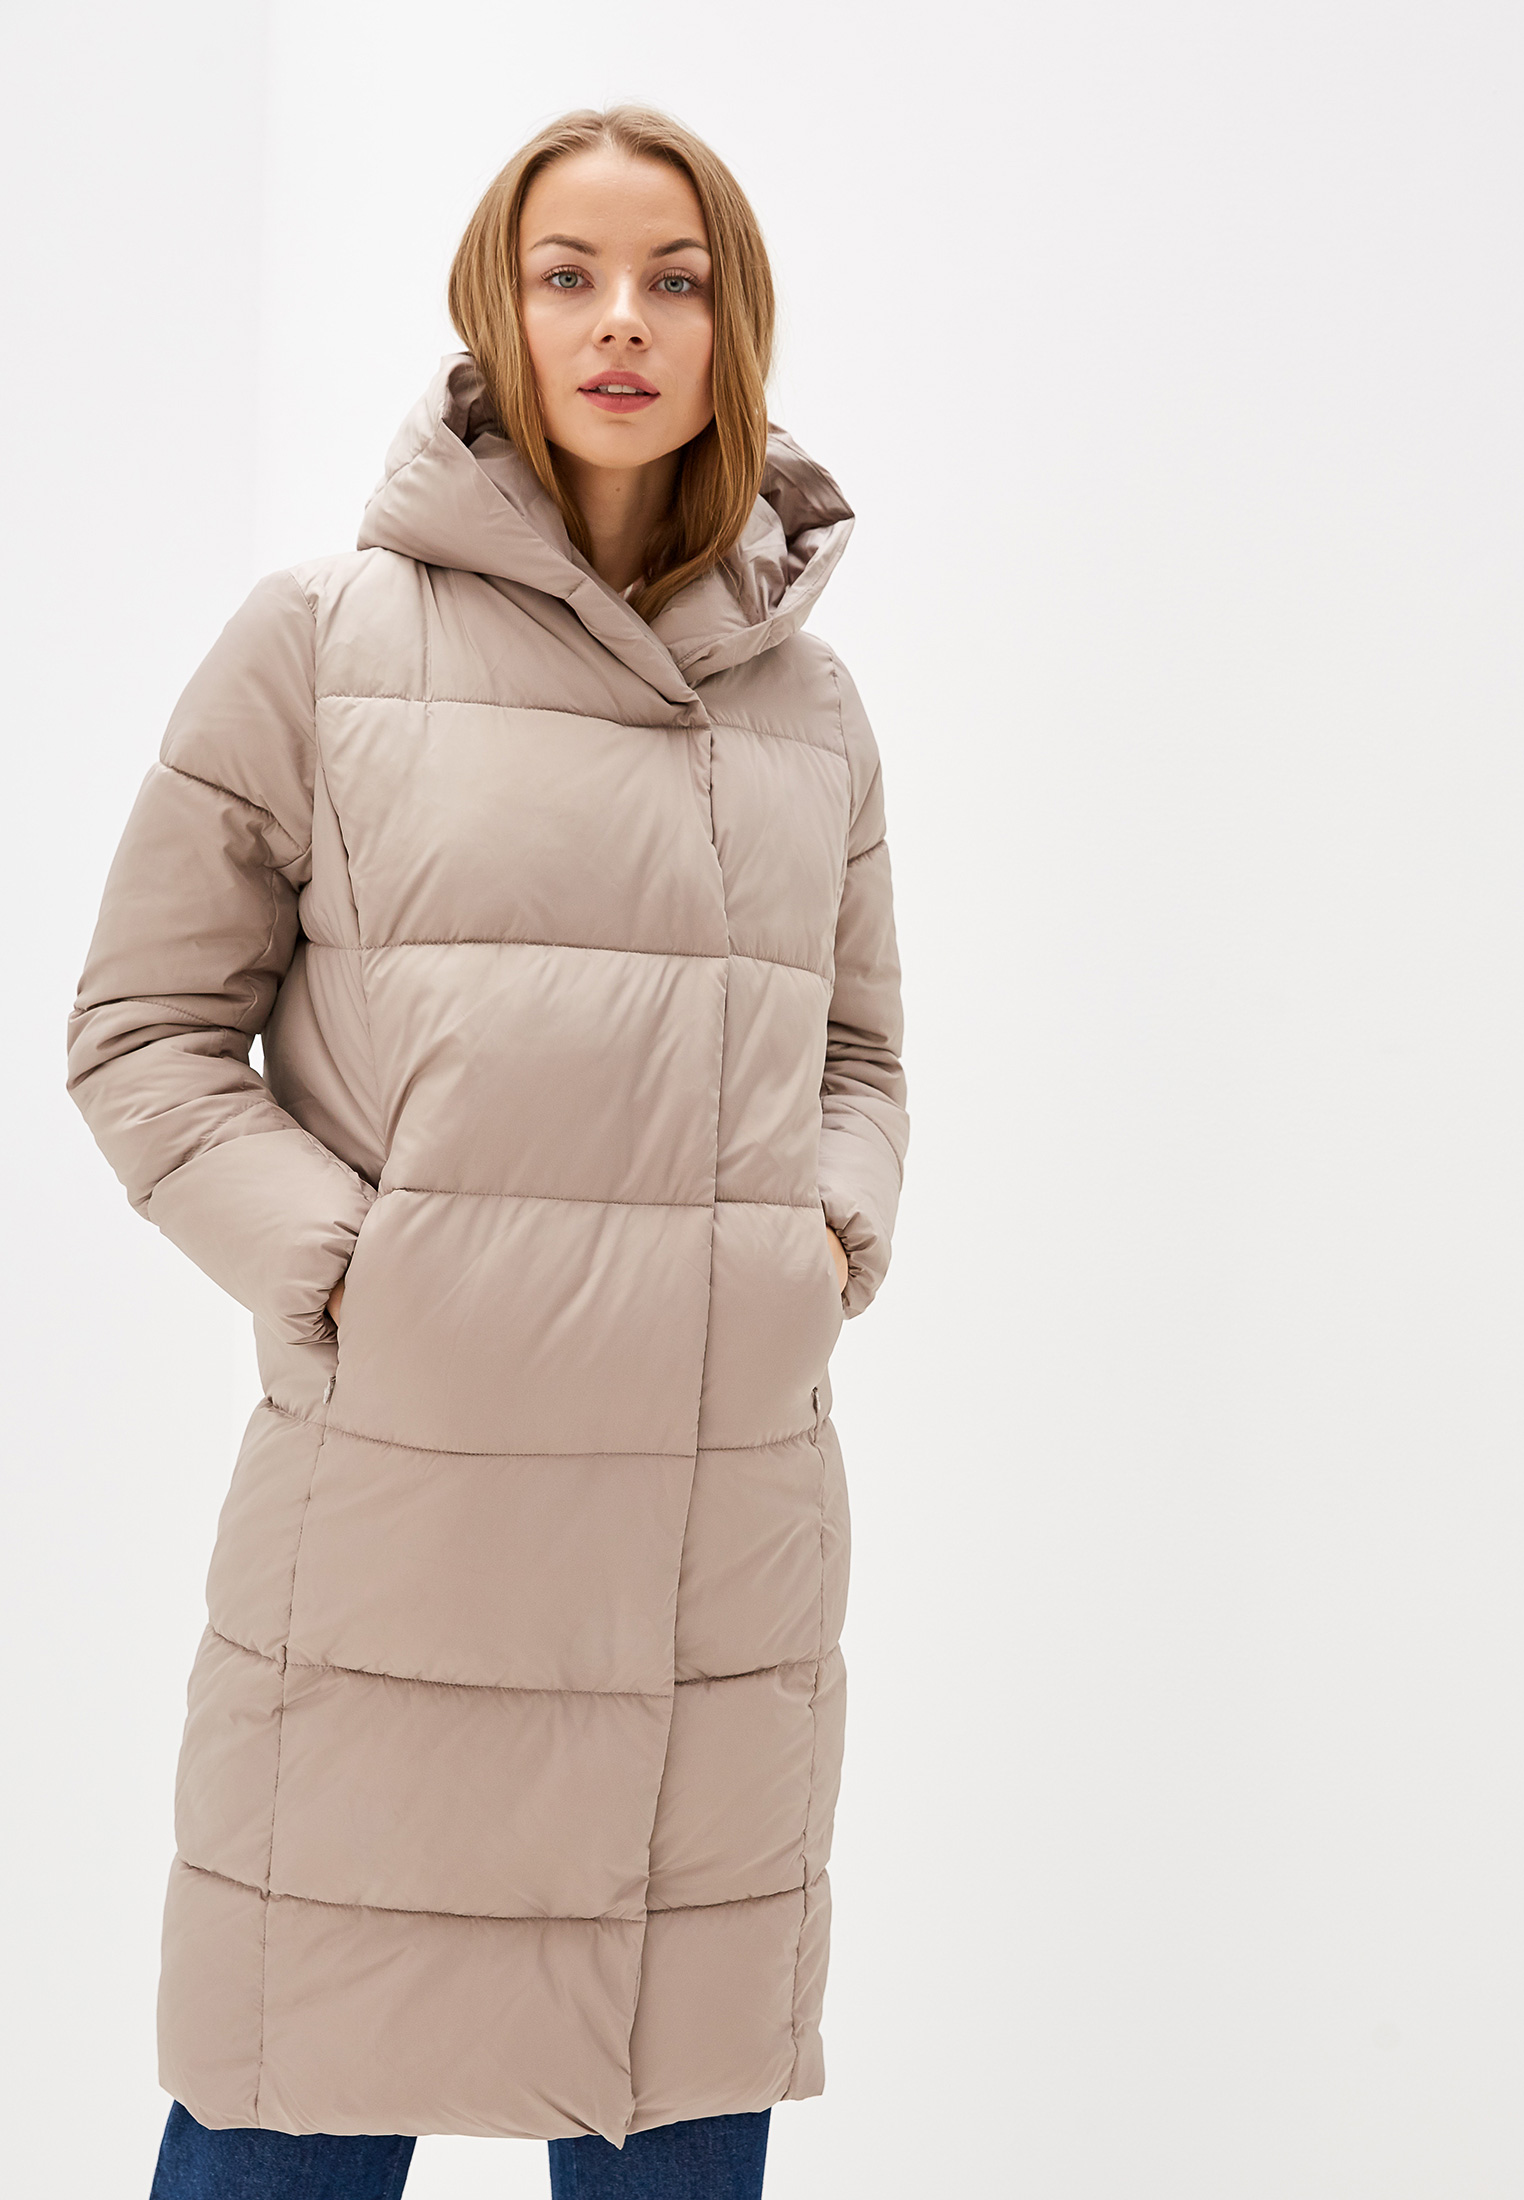 Куртка утепленная, Savage, цвет: бежевый. Артикул: SA004EWGESF2. Одежда / Верхняя одежда / Пуховики и зимние куртки